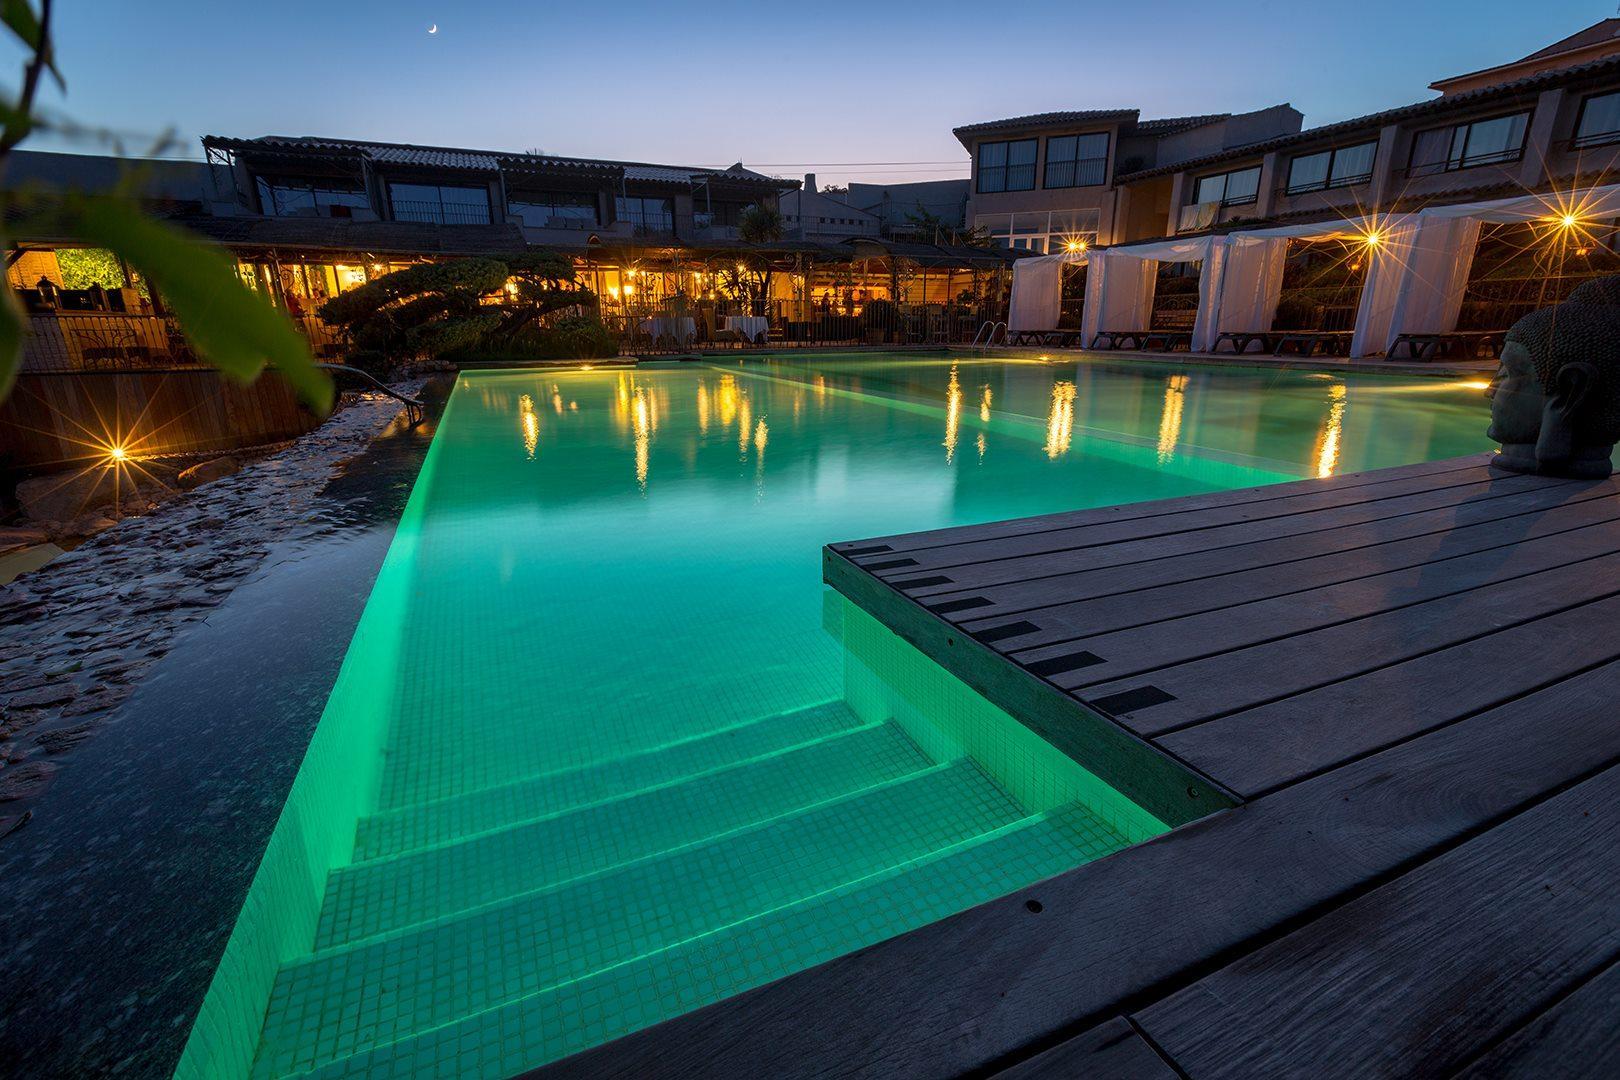 hotel-roi-theodore-et-spa-porto-vecchio-seminaires-de-caractere-piscine-de-nuit